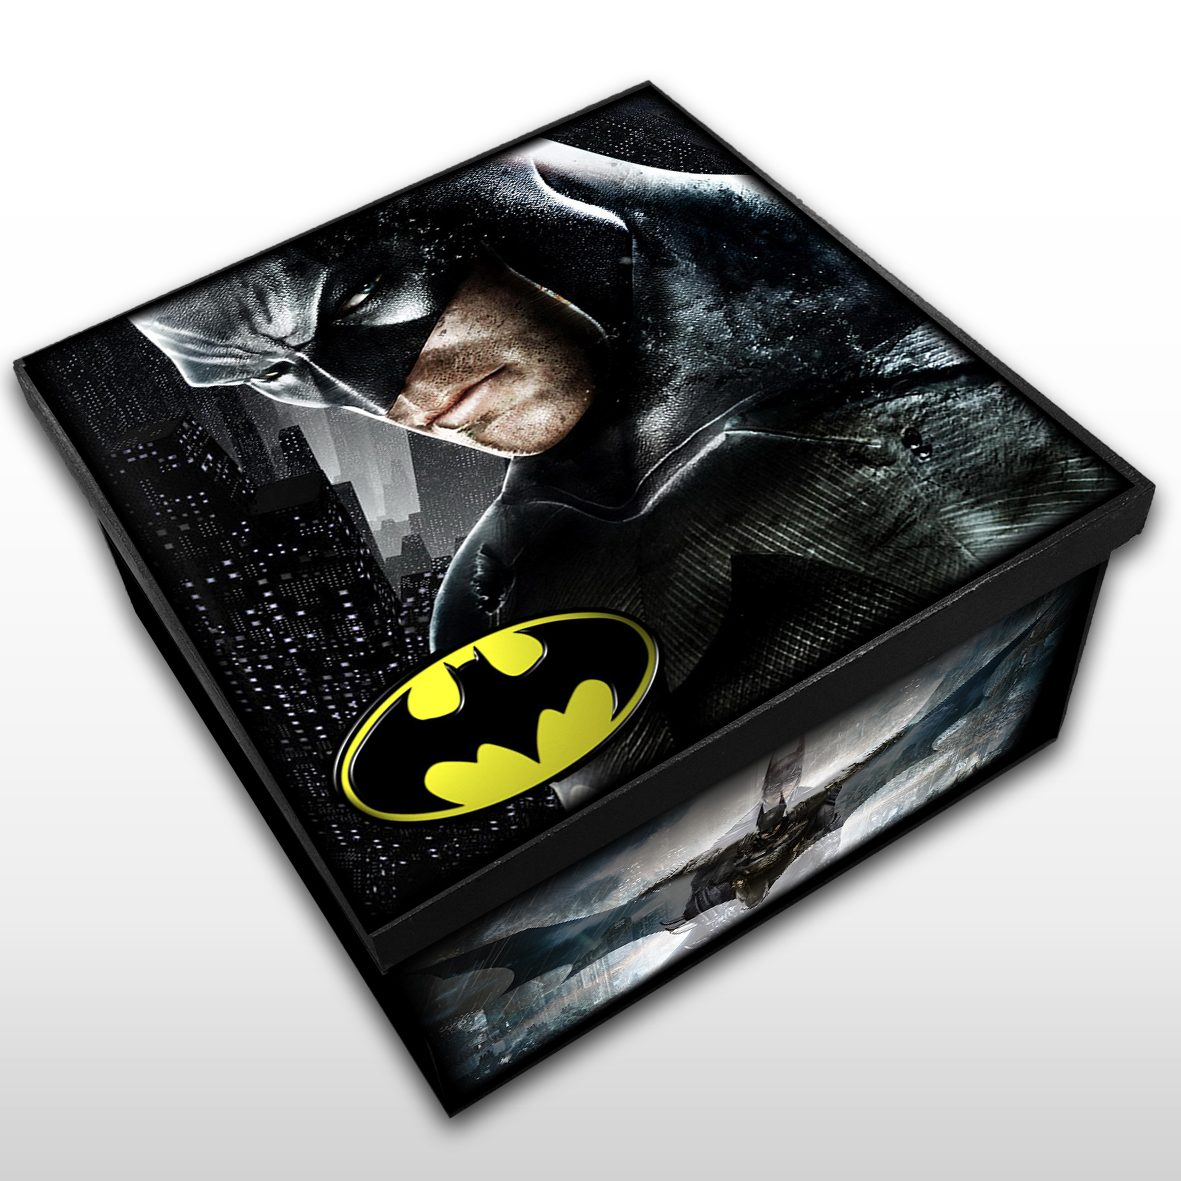 Batman - Caixa em MDF - Tam. Médio - Mr. Rock